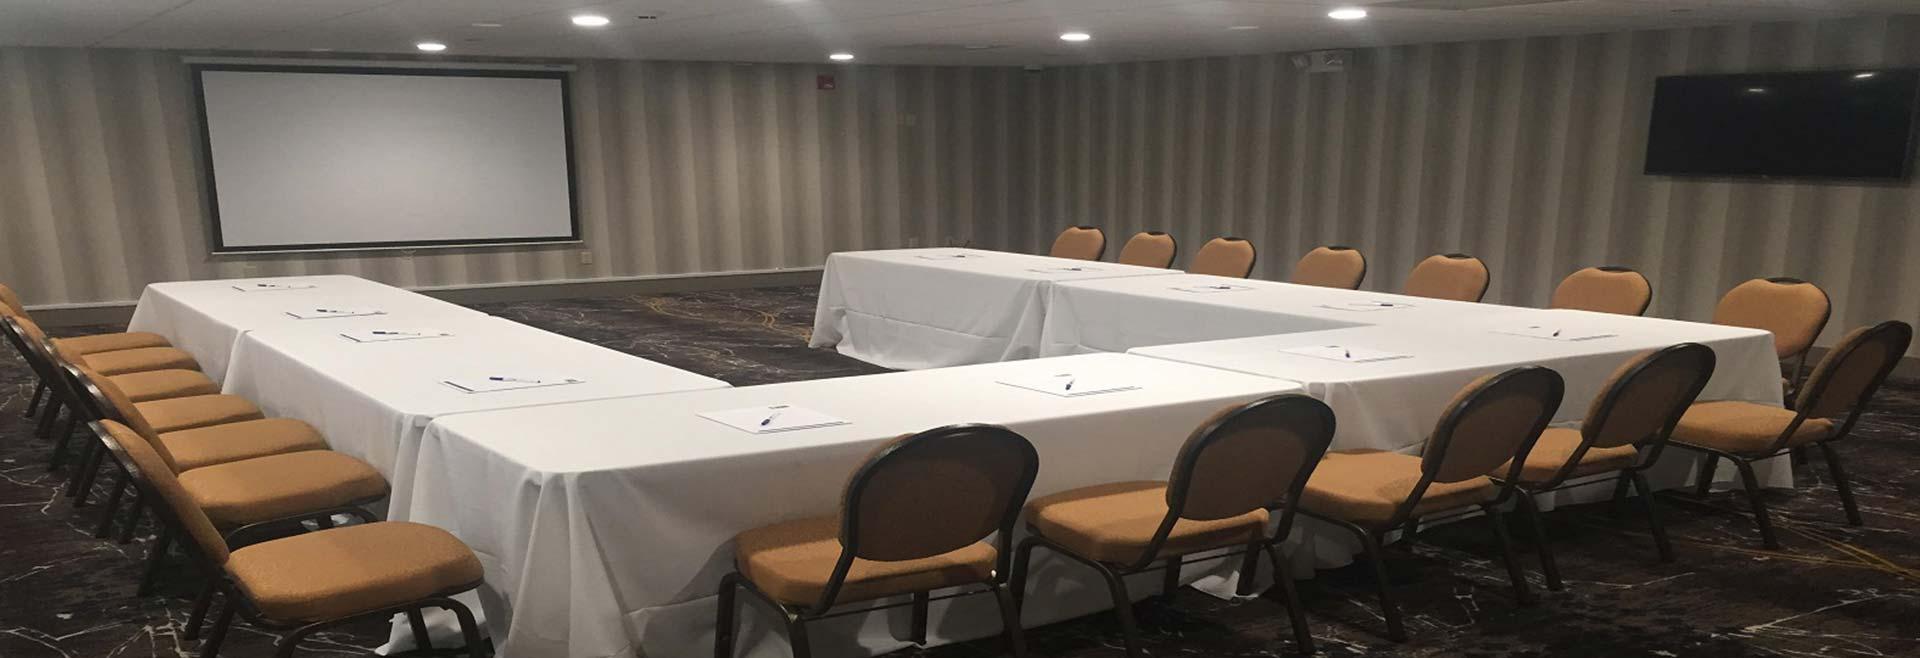 Meetings at California Hotel